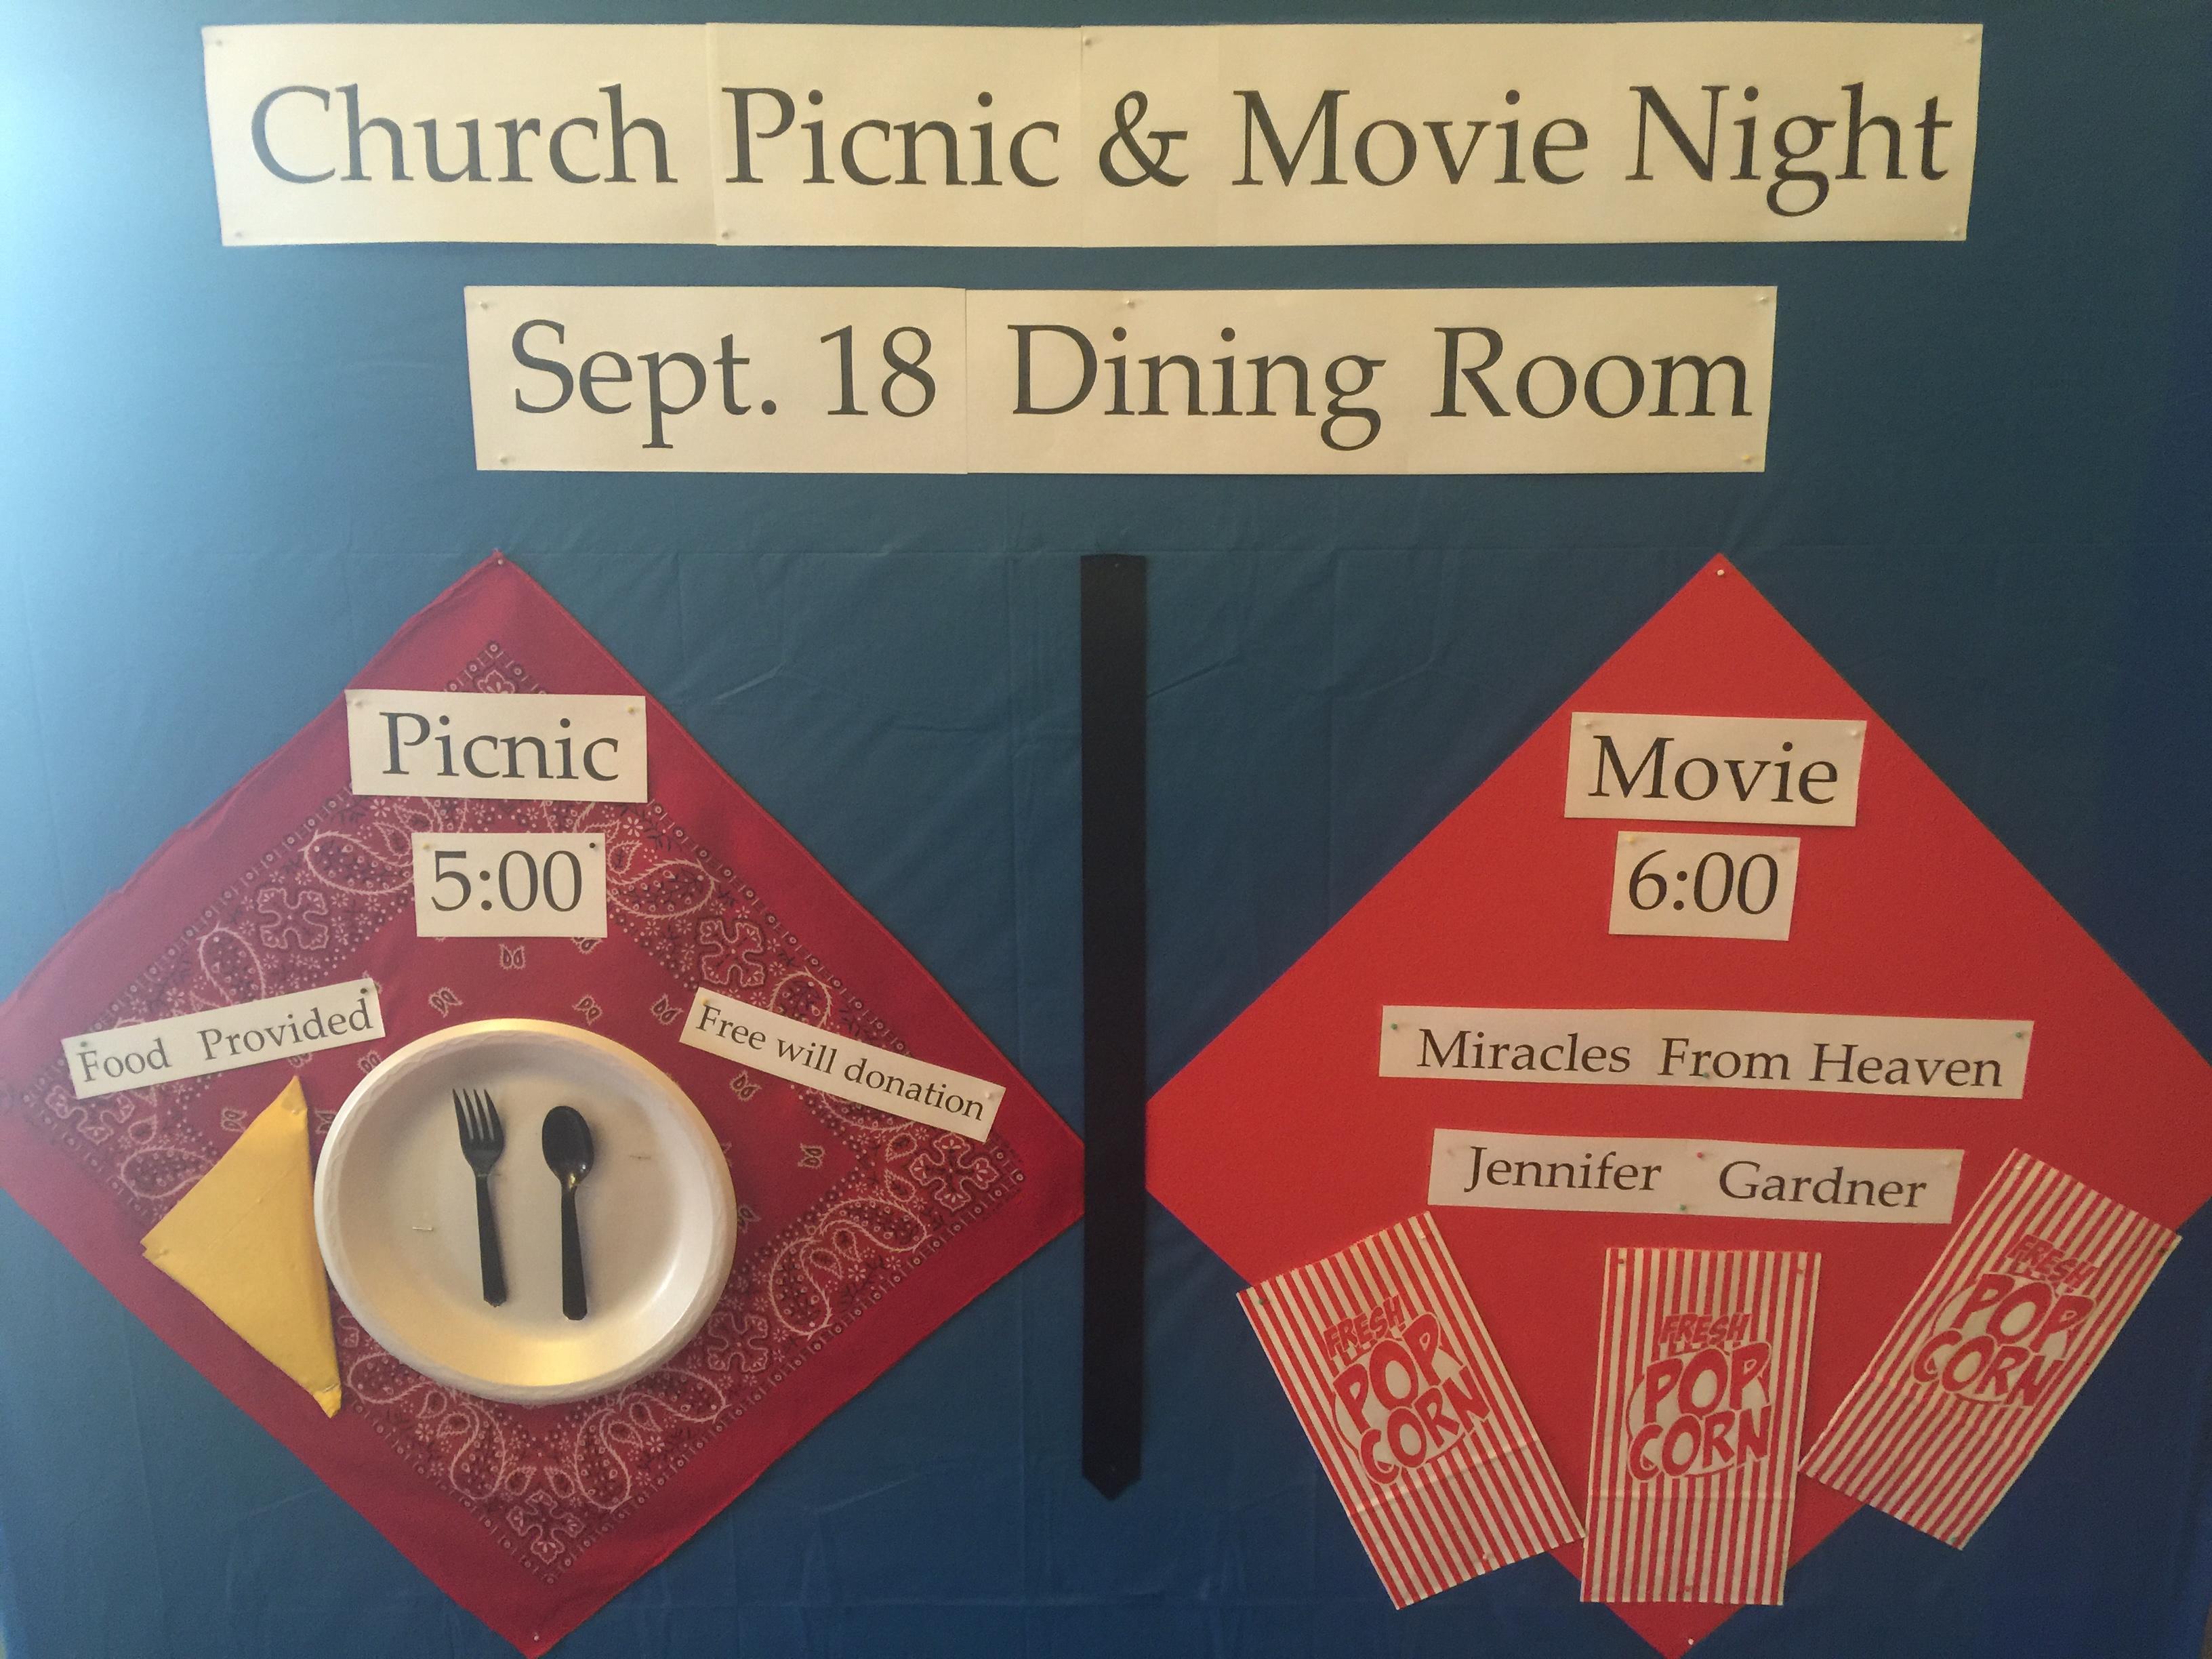 Picnic and Movie Night at Centenary